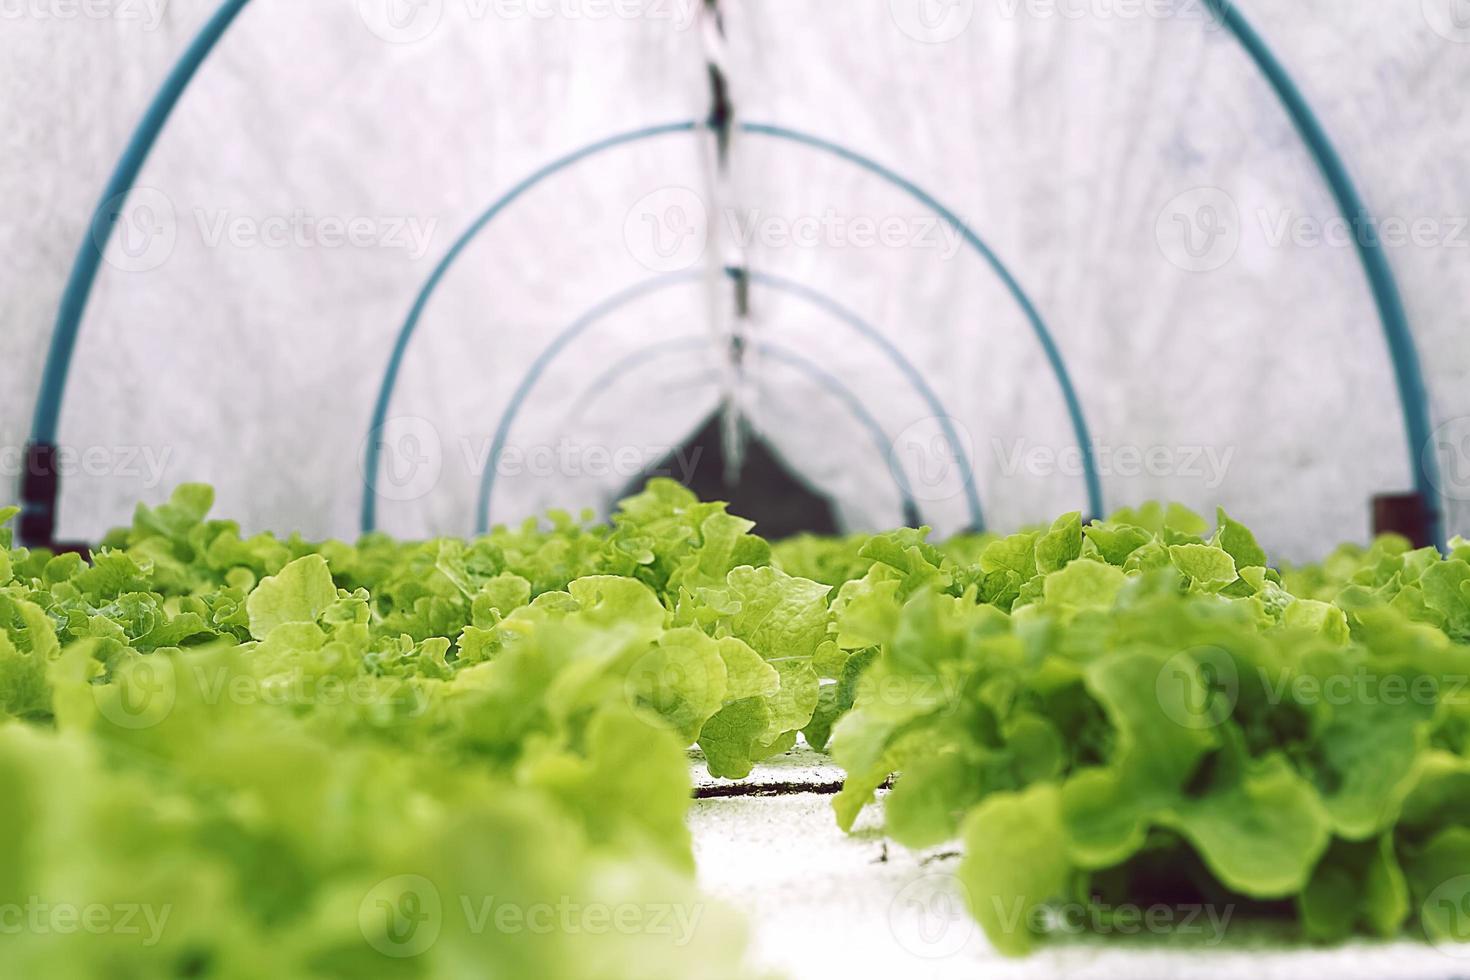 Hydroponics vegetable photo